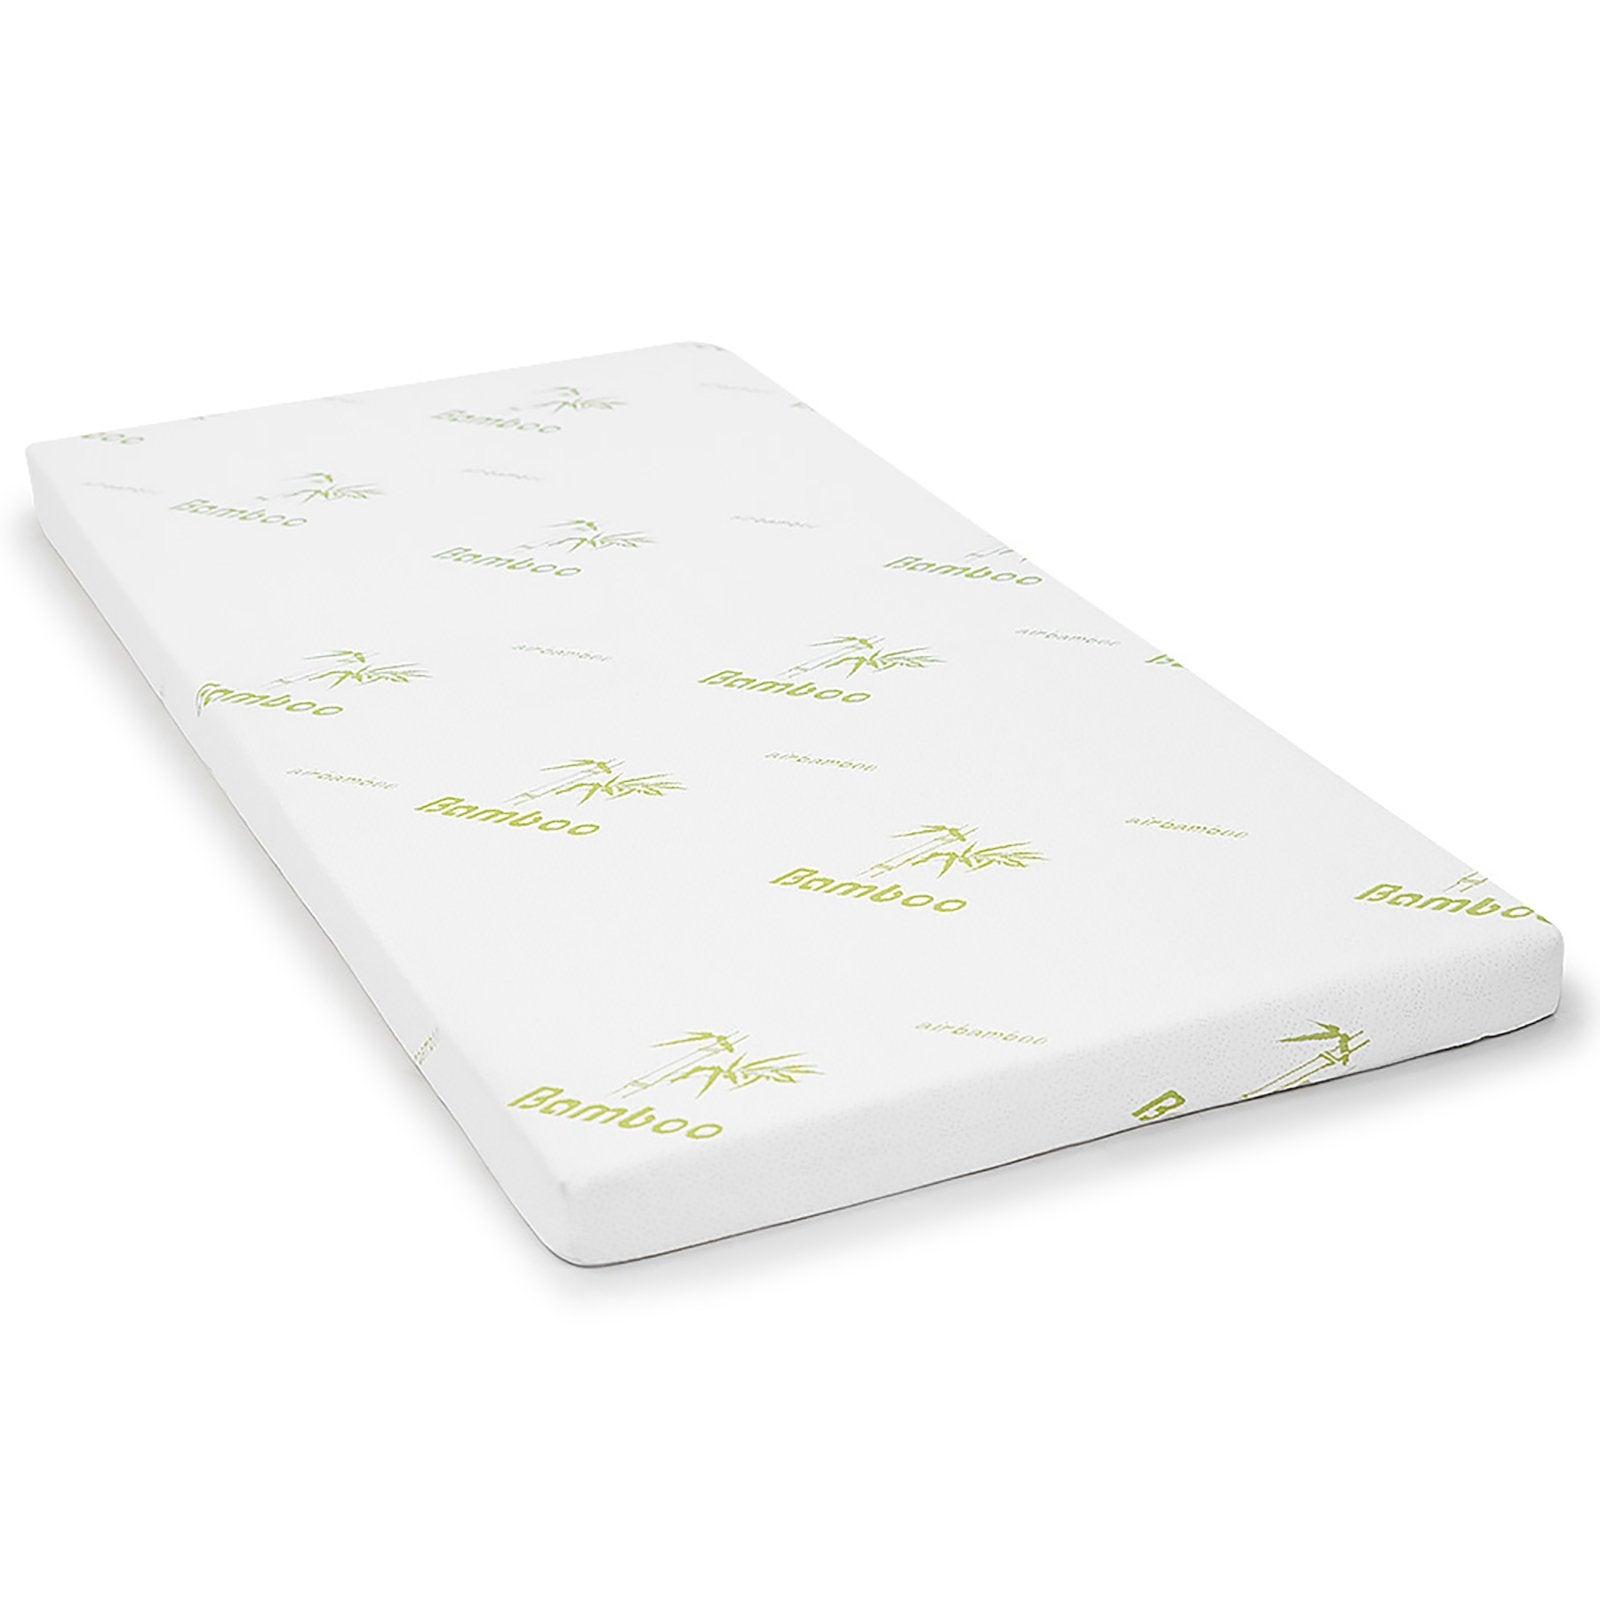 Cool Gel Memory Foam Mattress Topper Bamboo Fabric Cover Ecologic